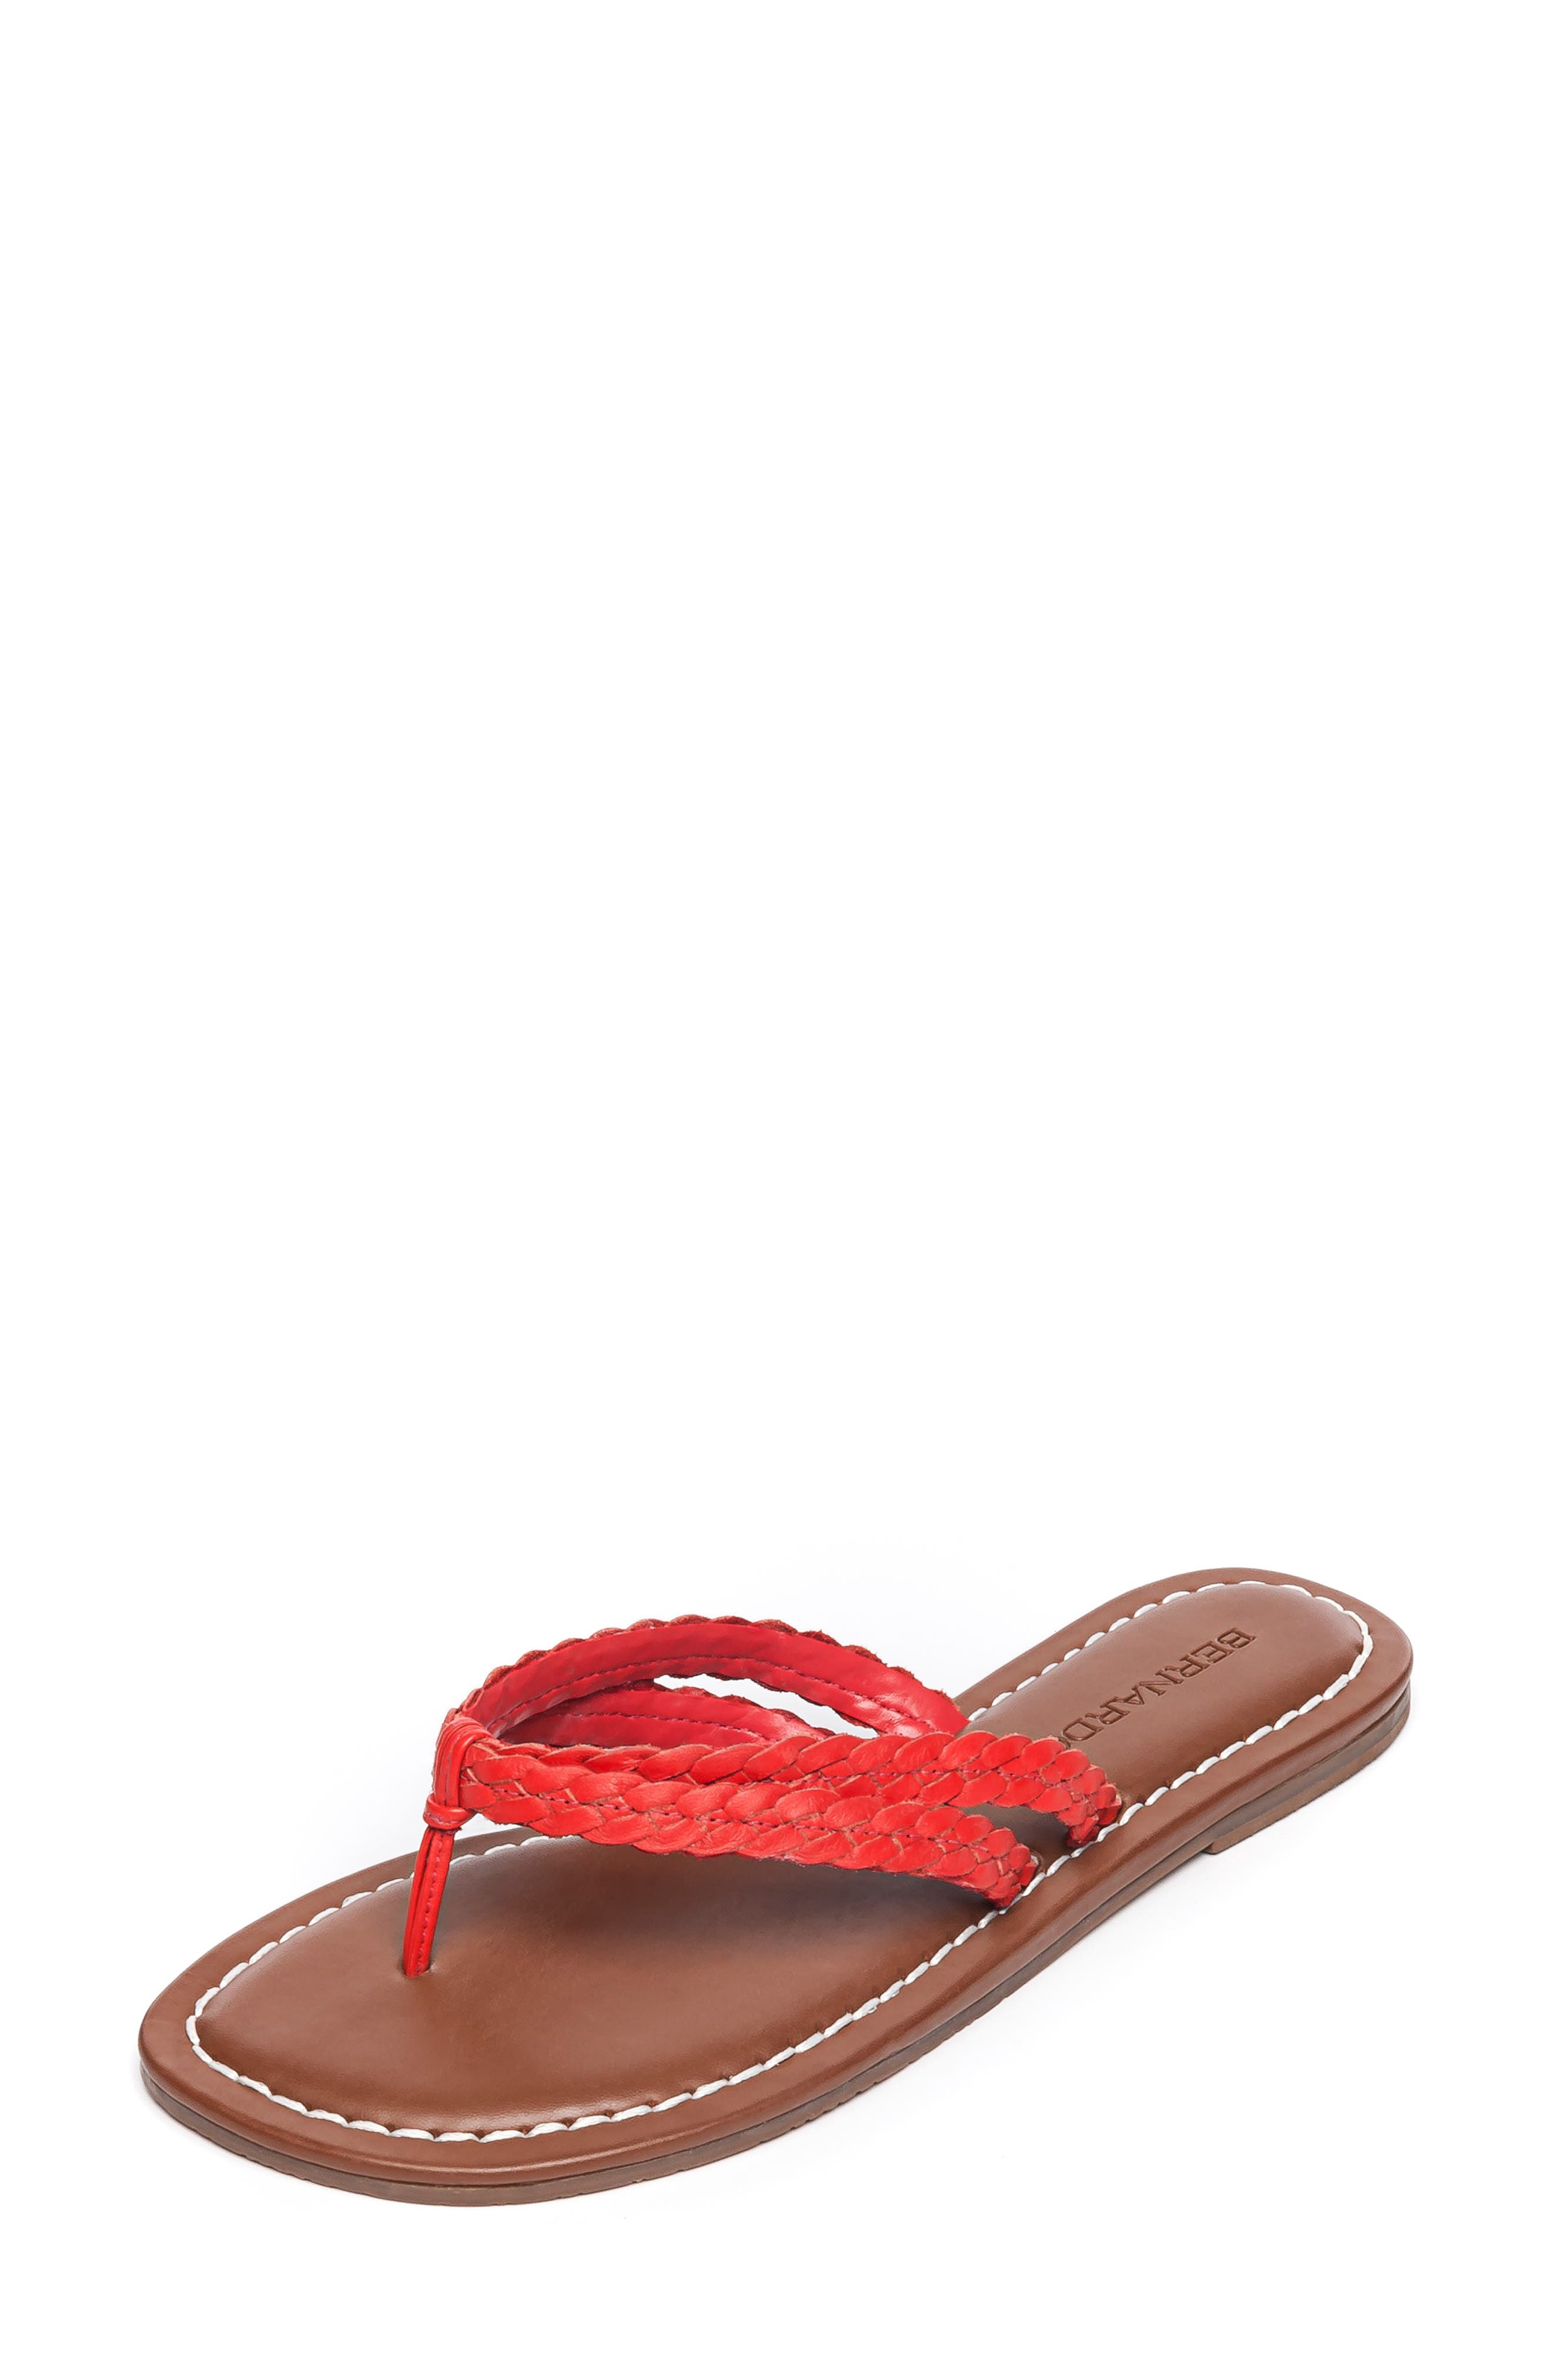 Bernardo Mariah Flip Flop, Red